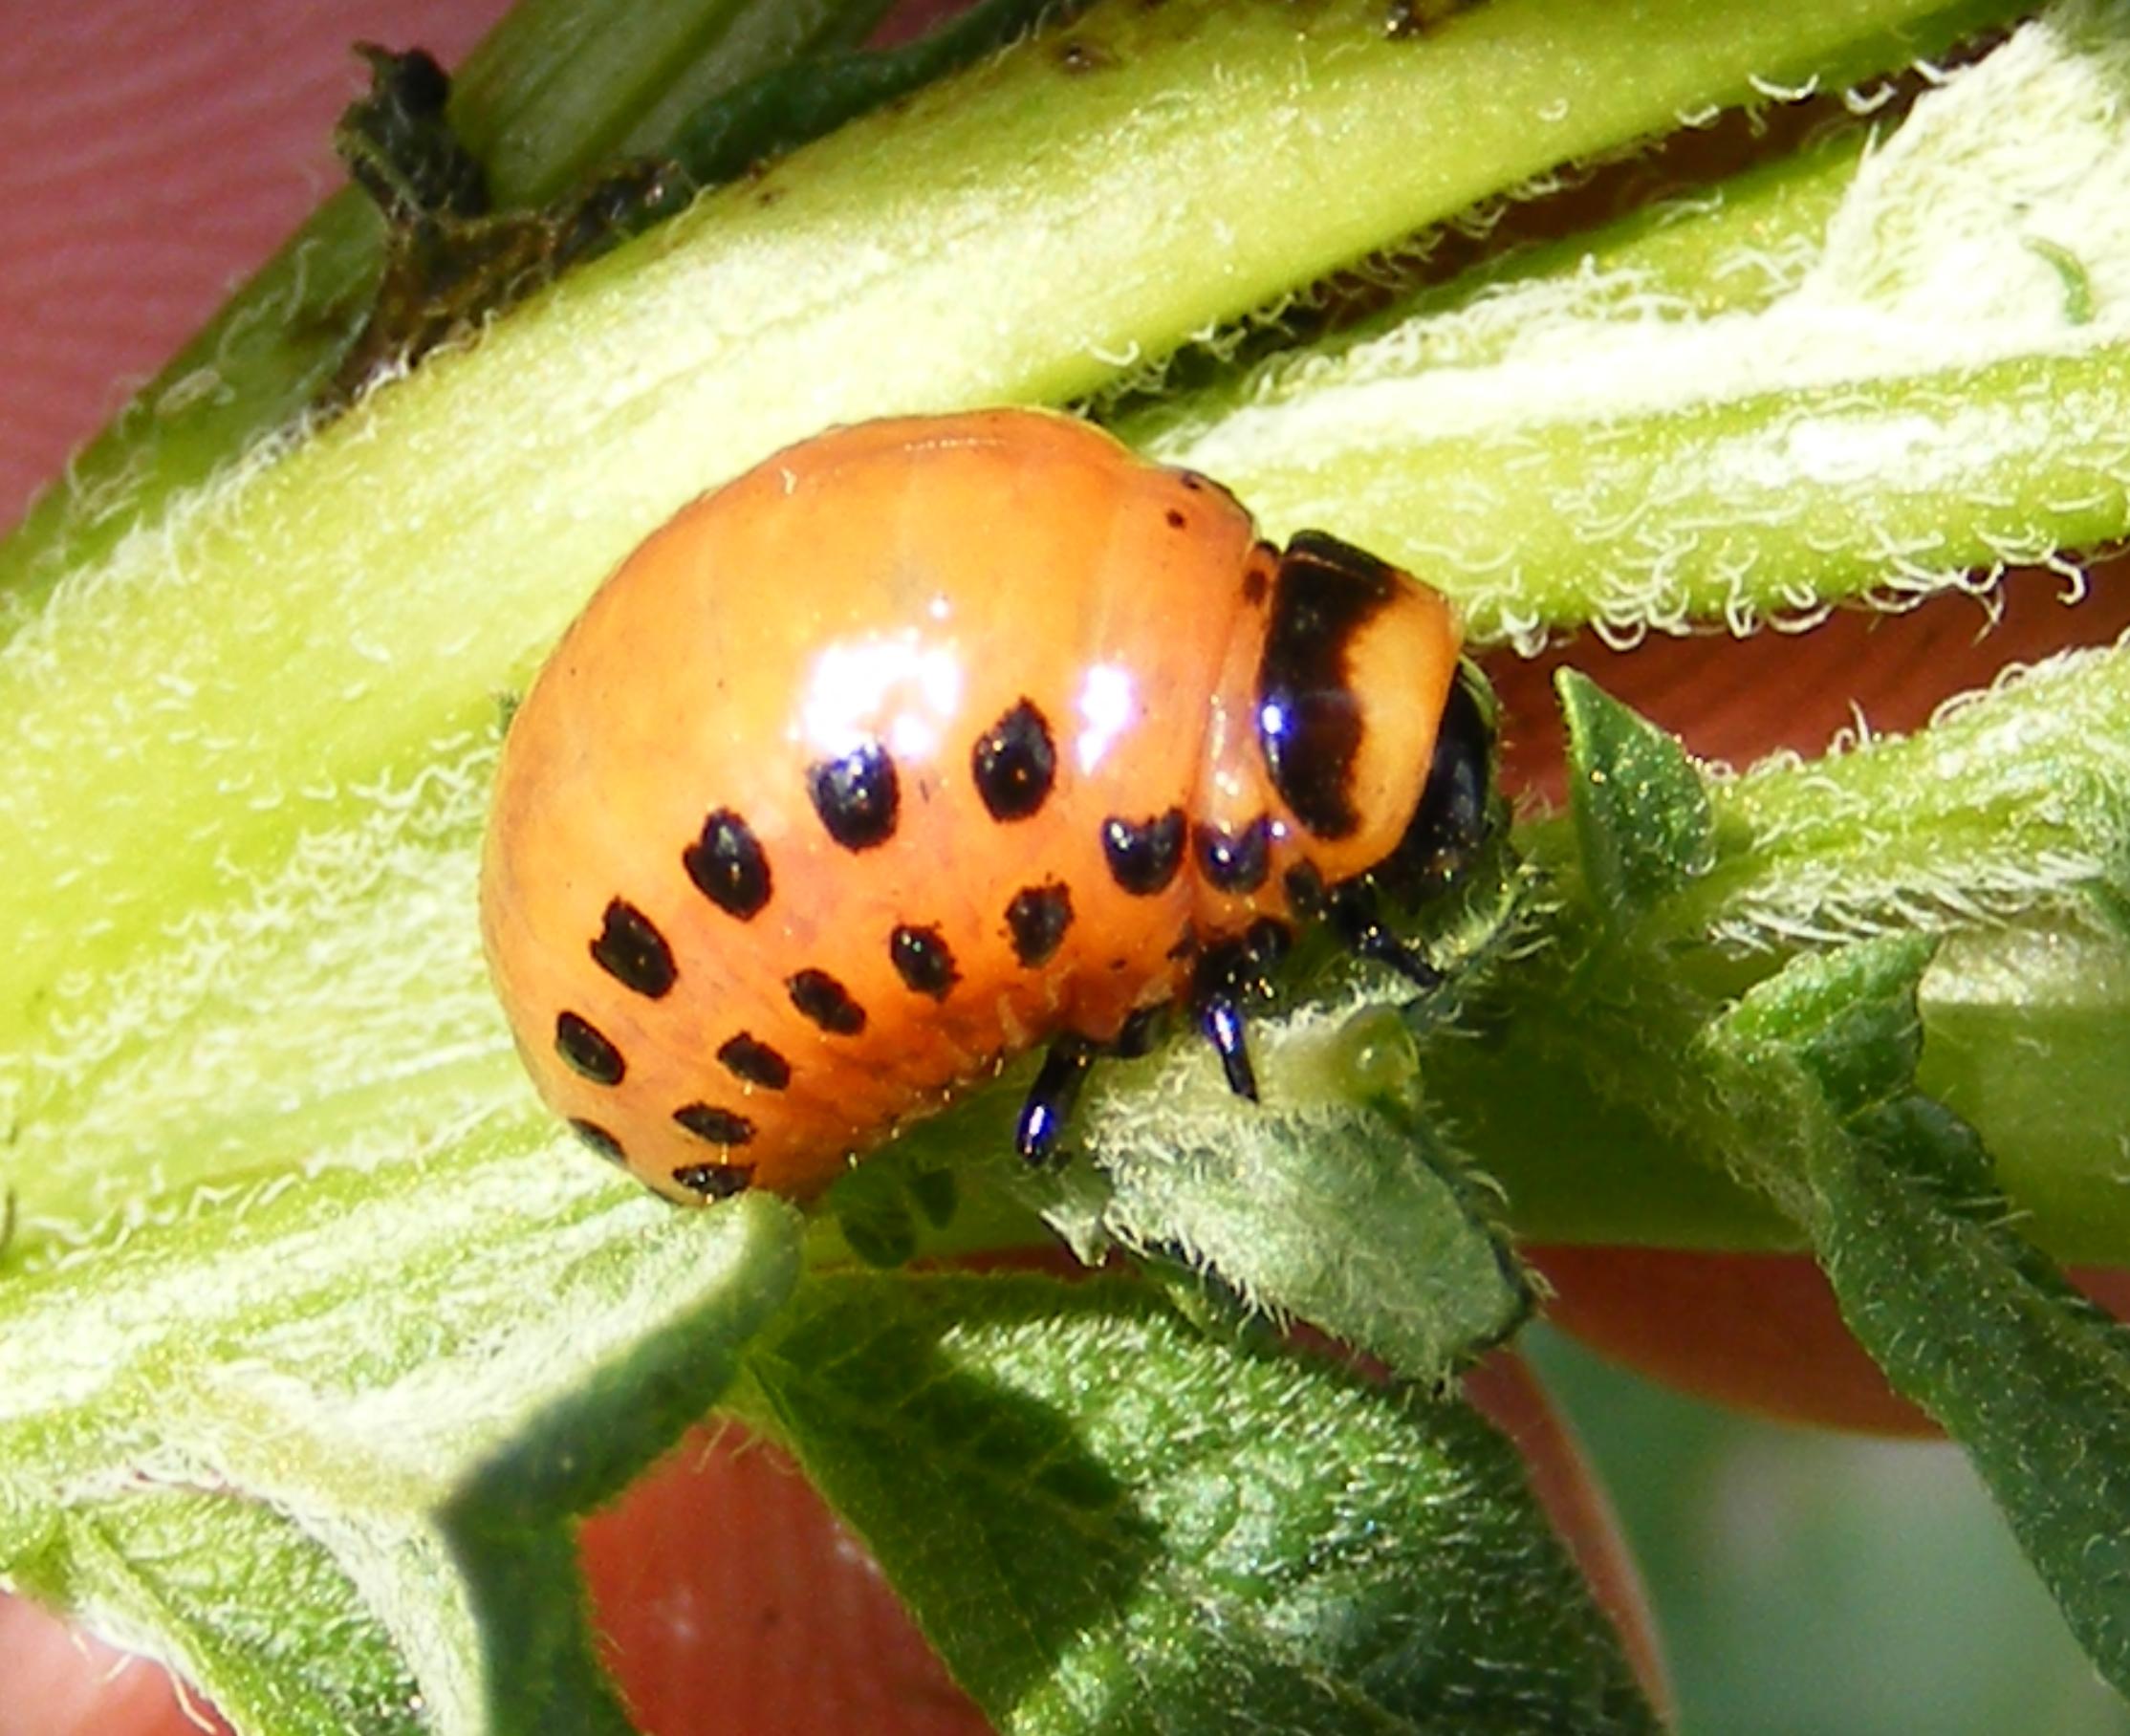 Plant-Insect Interaction: Colorado potato beetle larvae ...